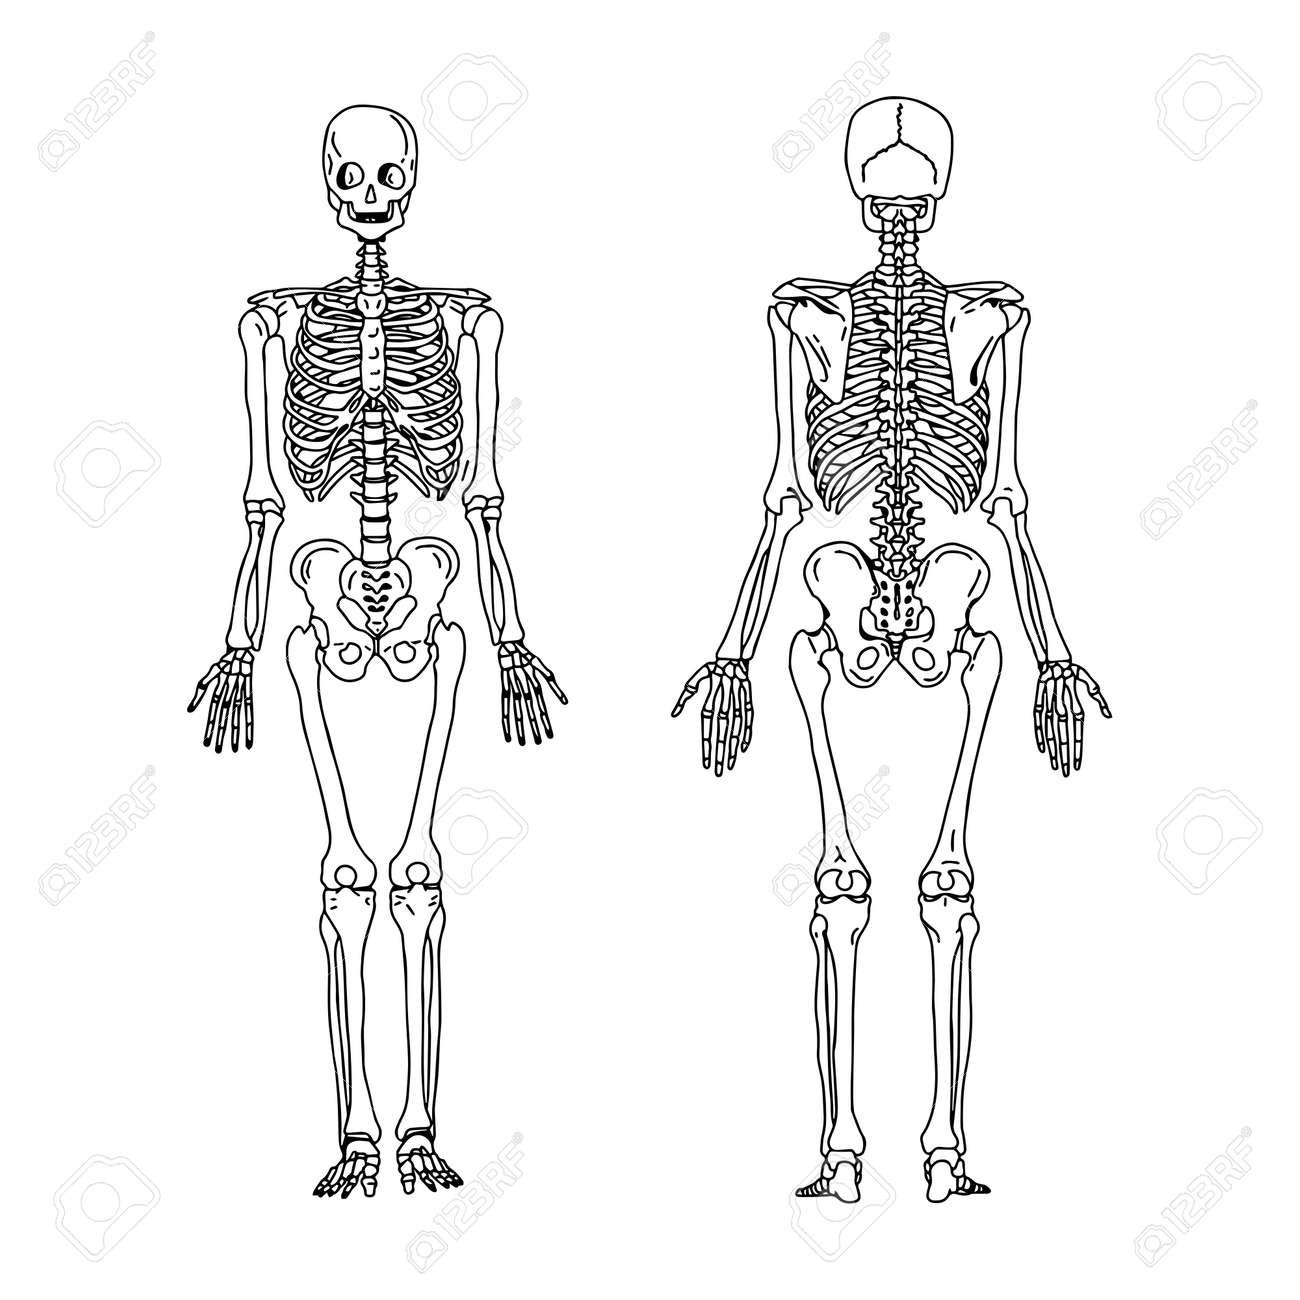 Ilustración Vectorial Mano Dibujar Garabatos De Esqueleto Humano ...